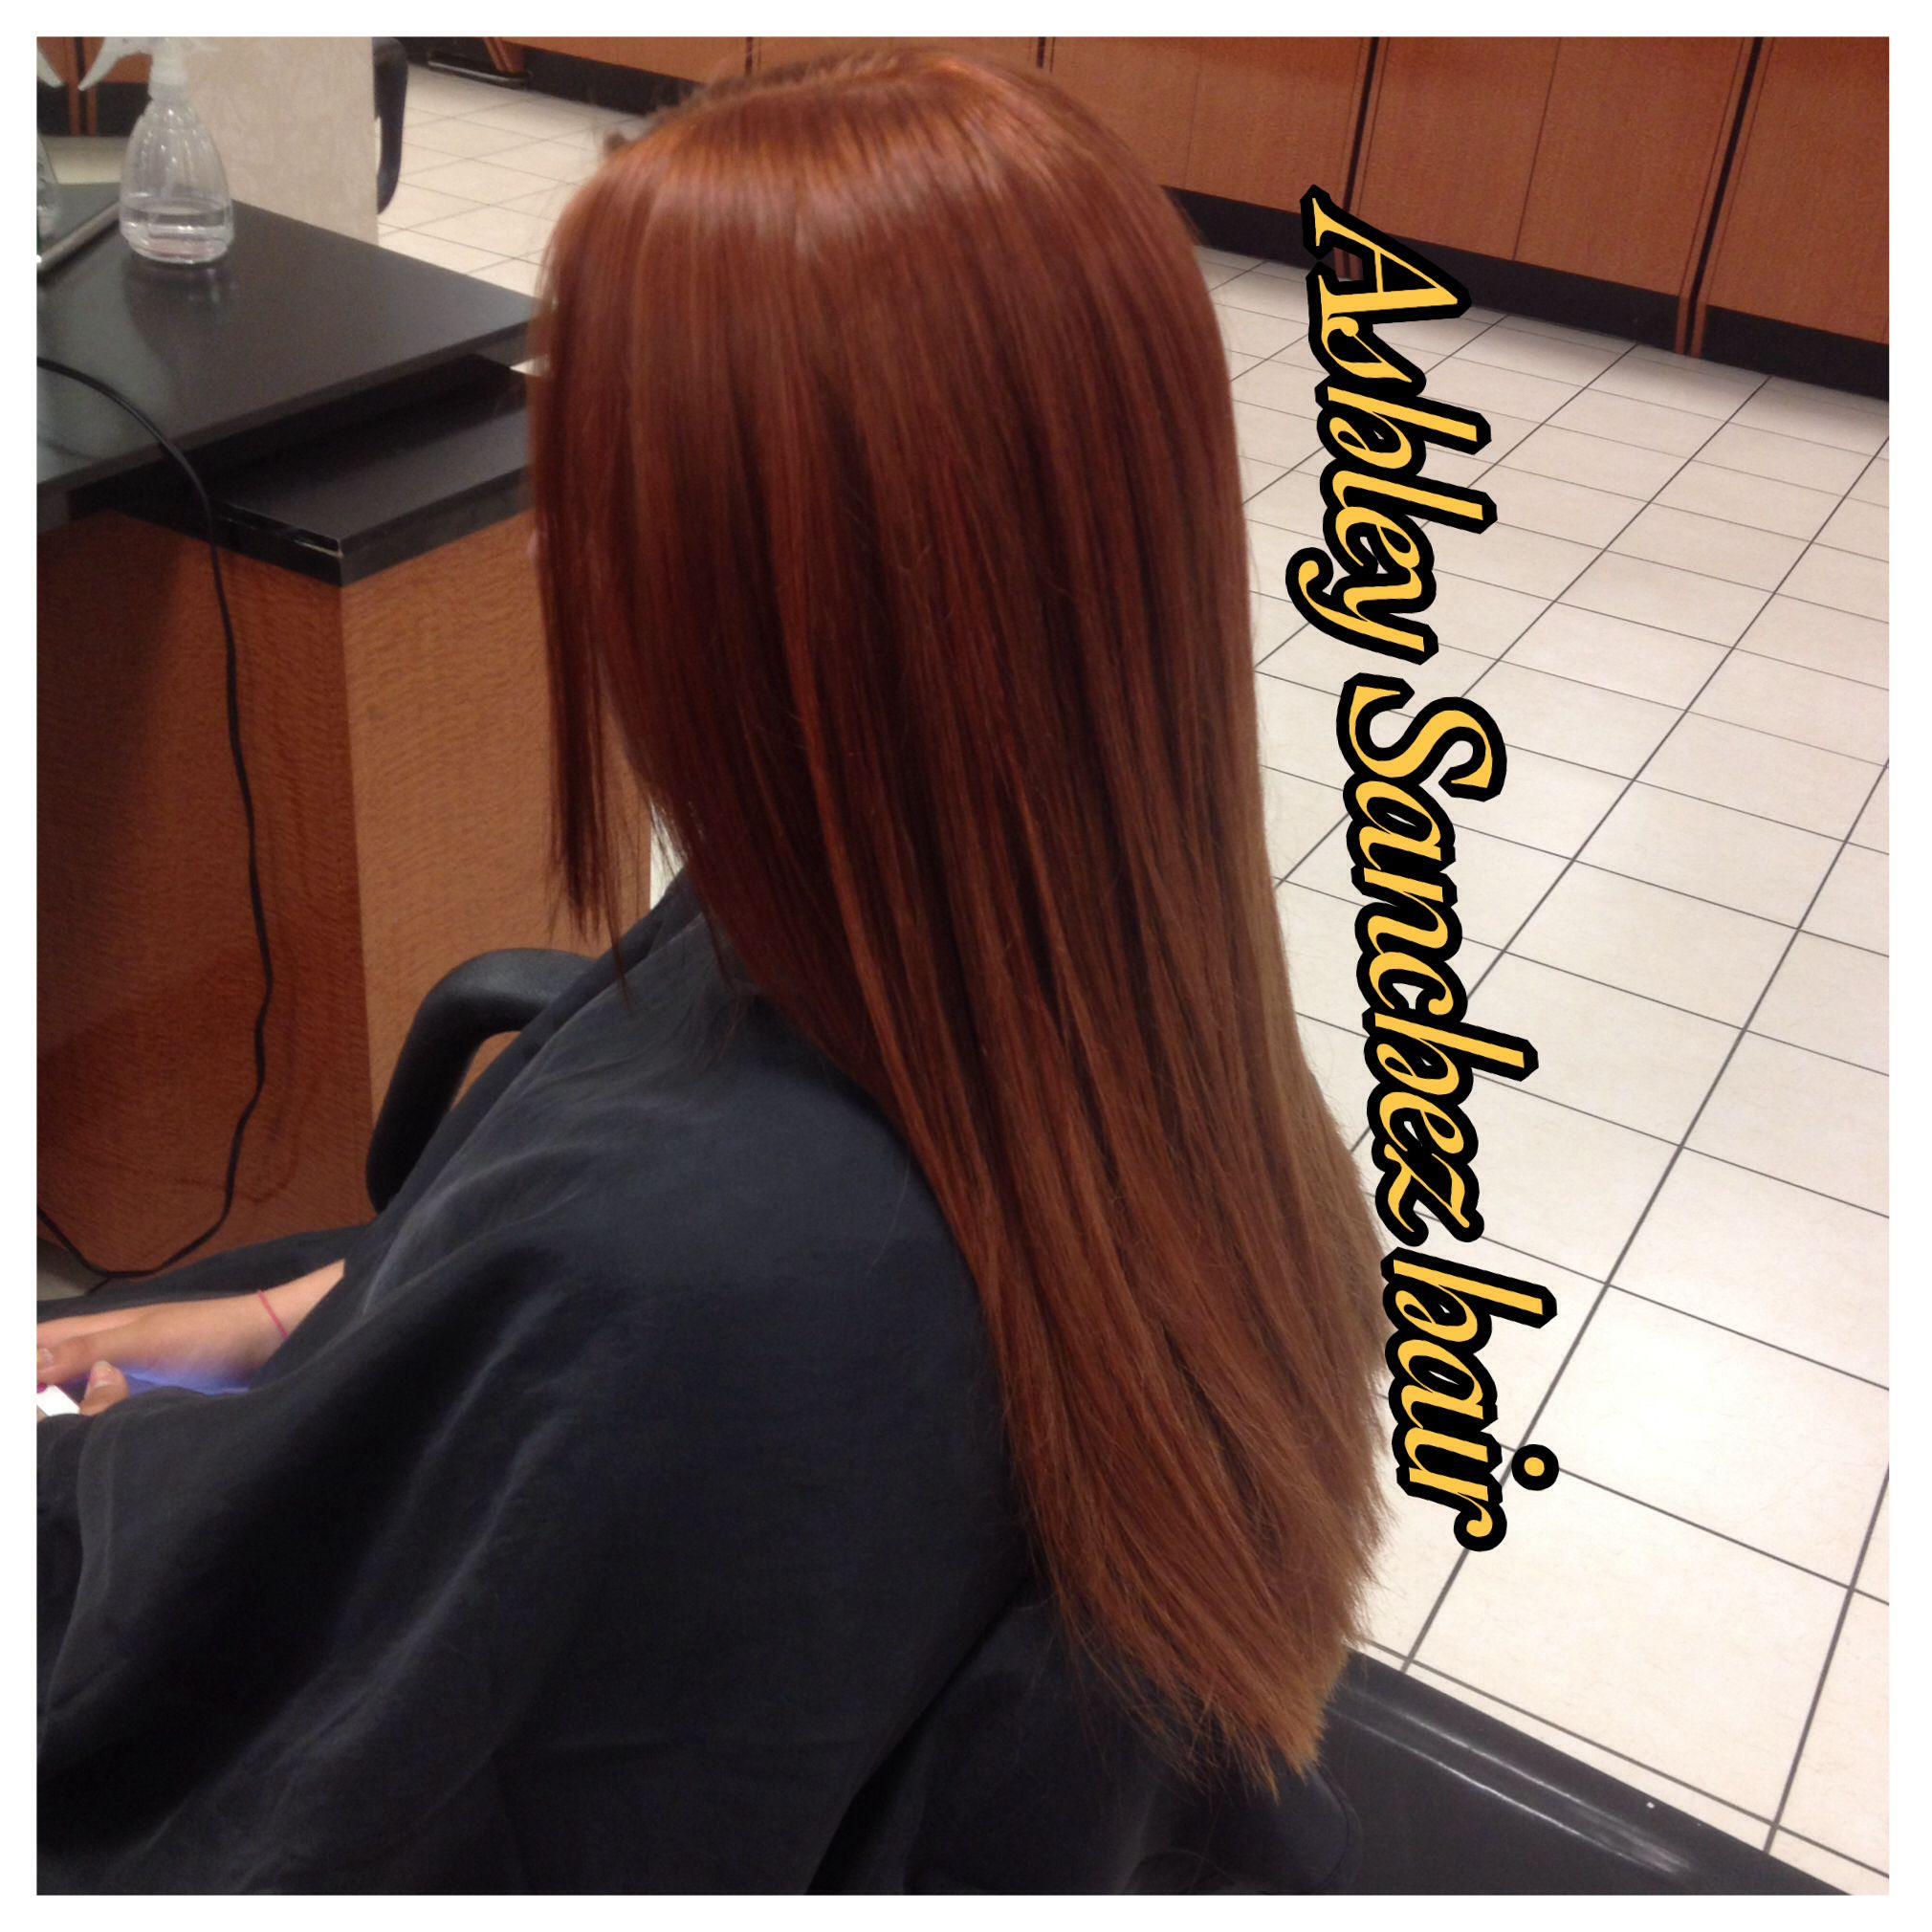 Red Hair Matrix Hair Color Instagramidohair559 Jcpenney Salon